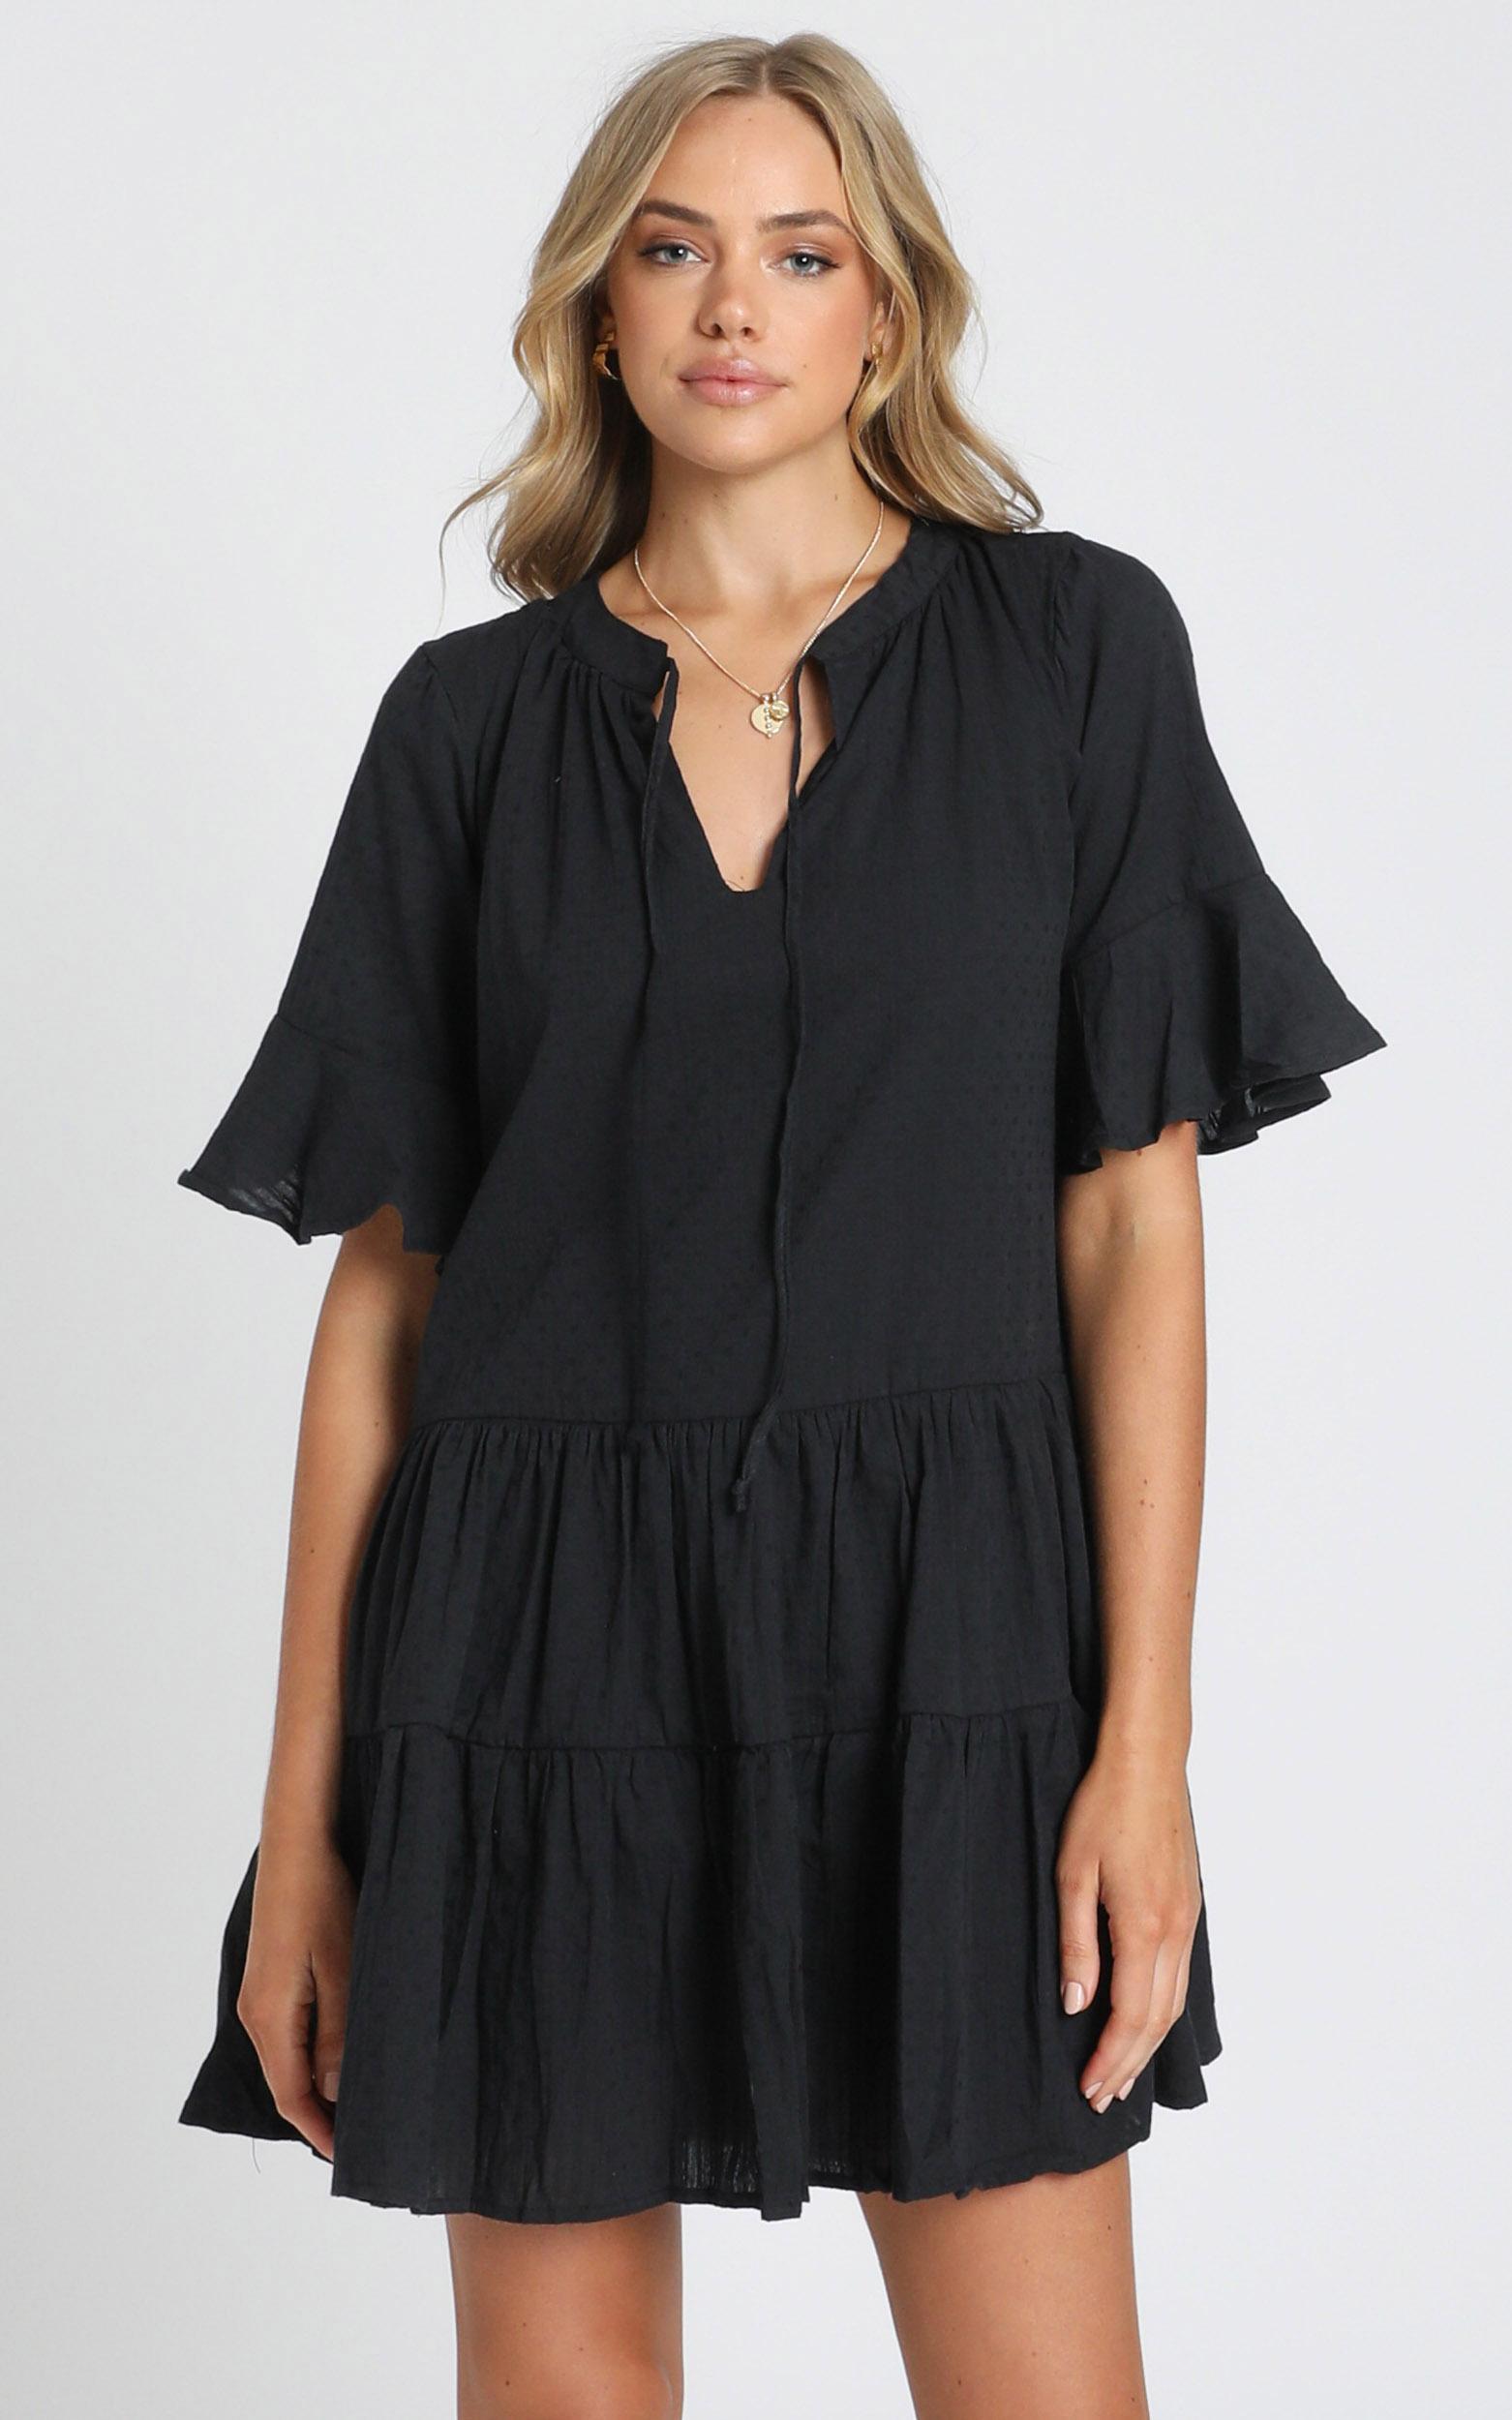 Best Memories dress in black - 6 (XS), Black, hi-res image number null